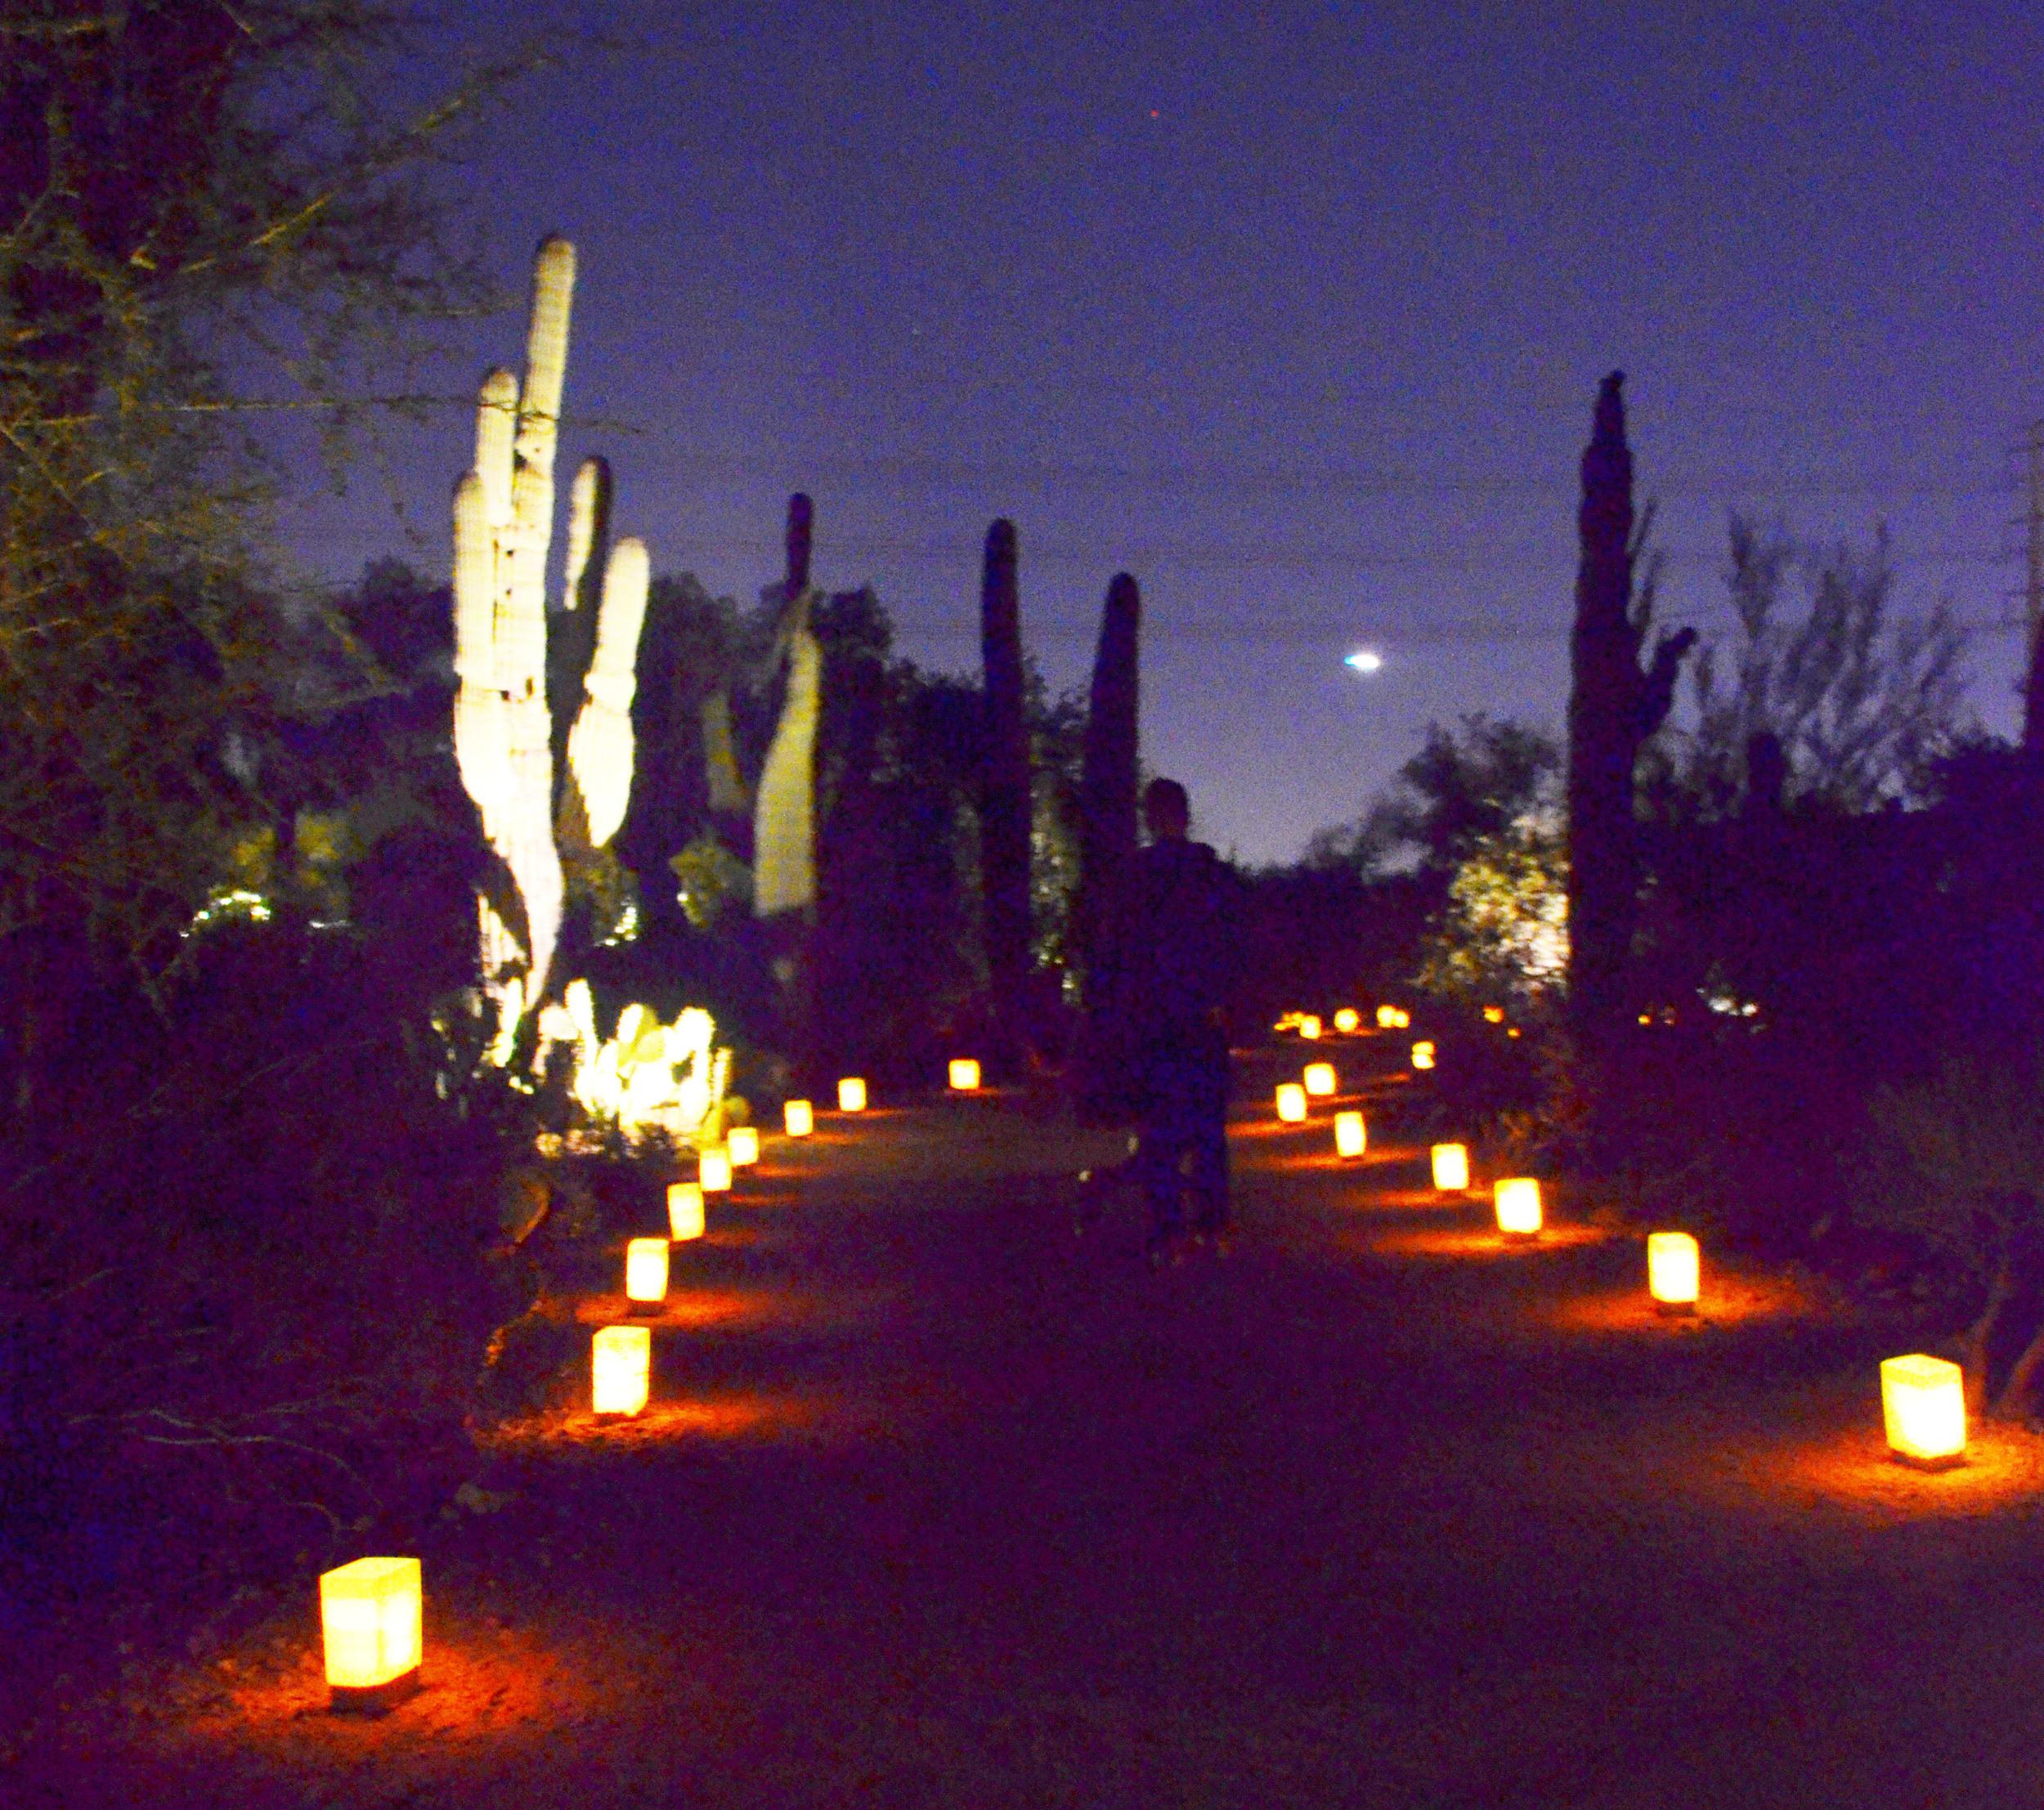 Las Noches de las luminarias at The Desert Botanical Gardens   Momma Society-The Community of Modern Moms   www.MommaSociety.com